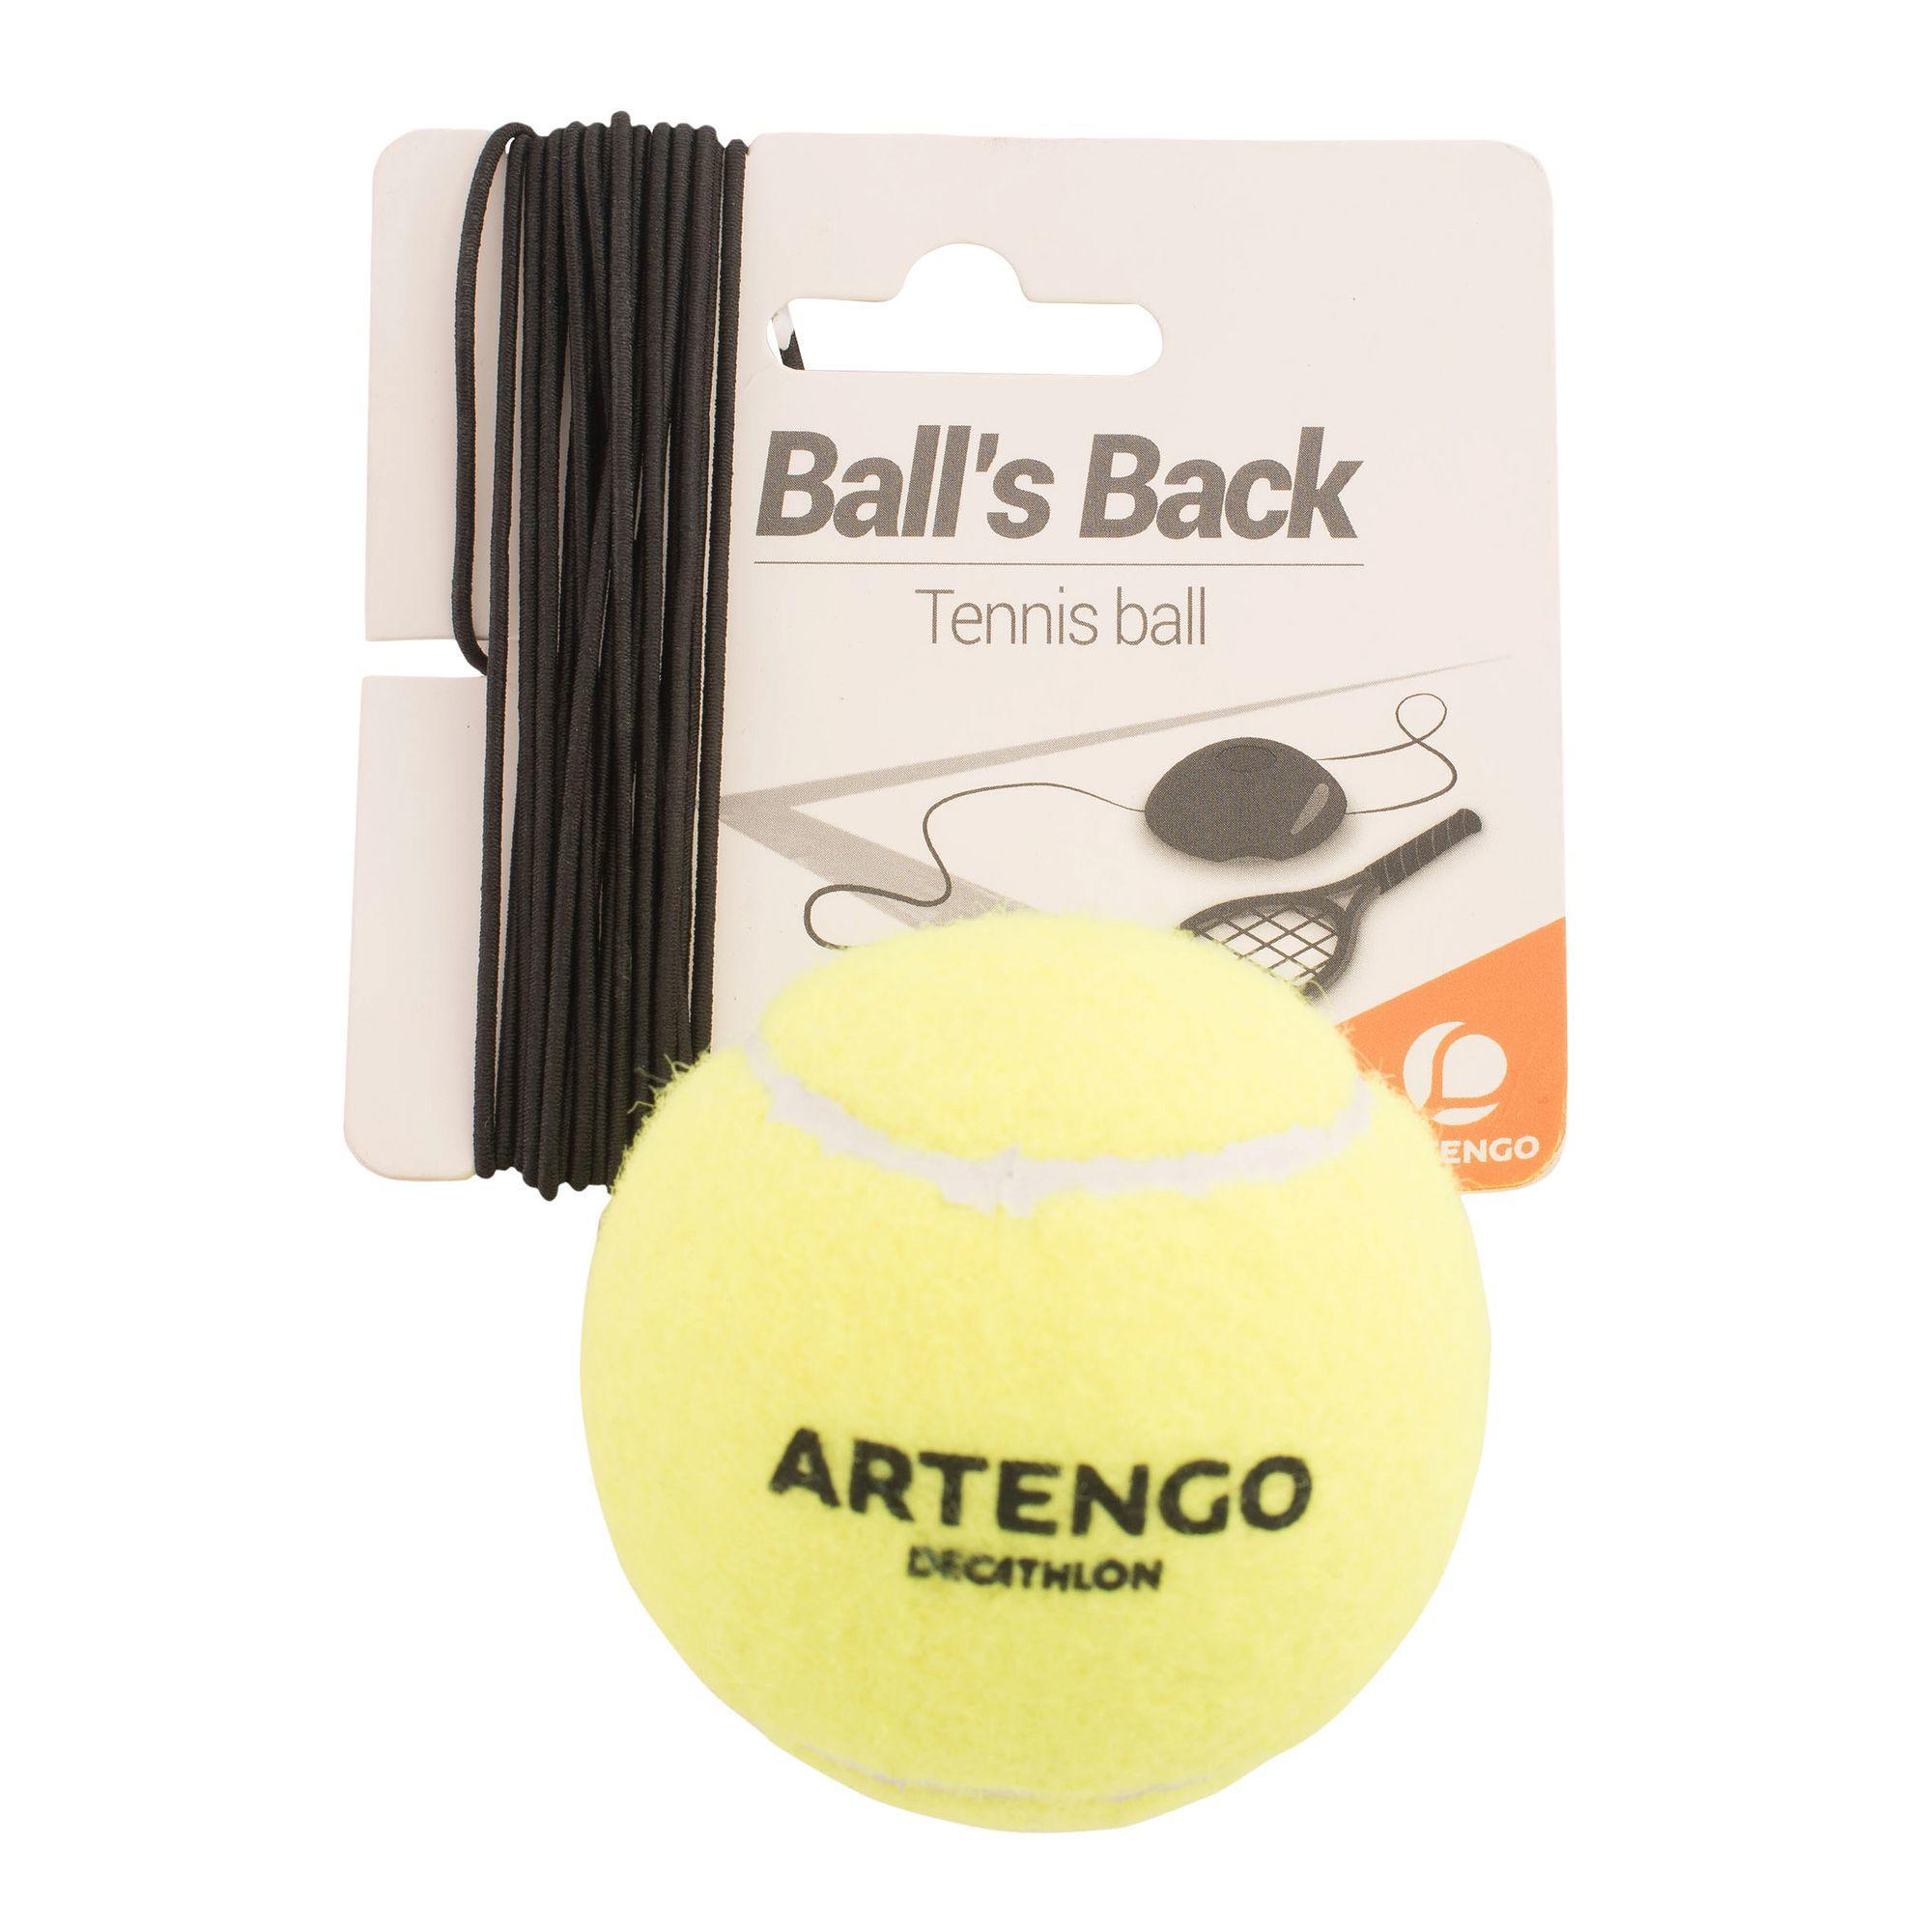 Ball's back tennis ball amarillo